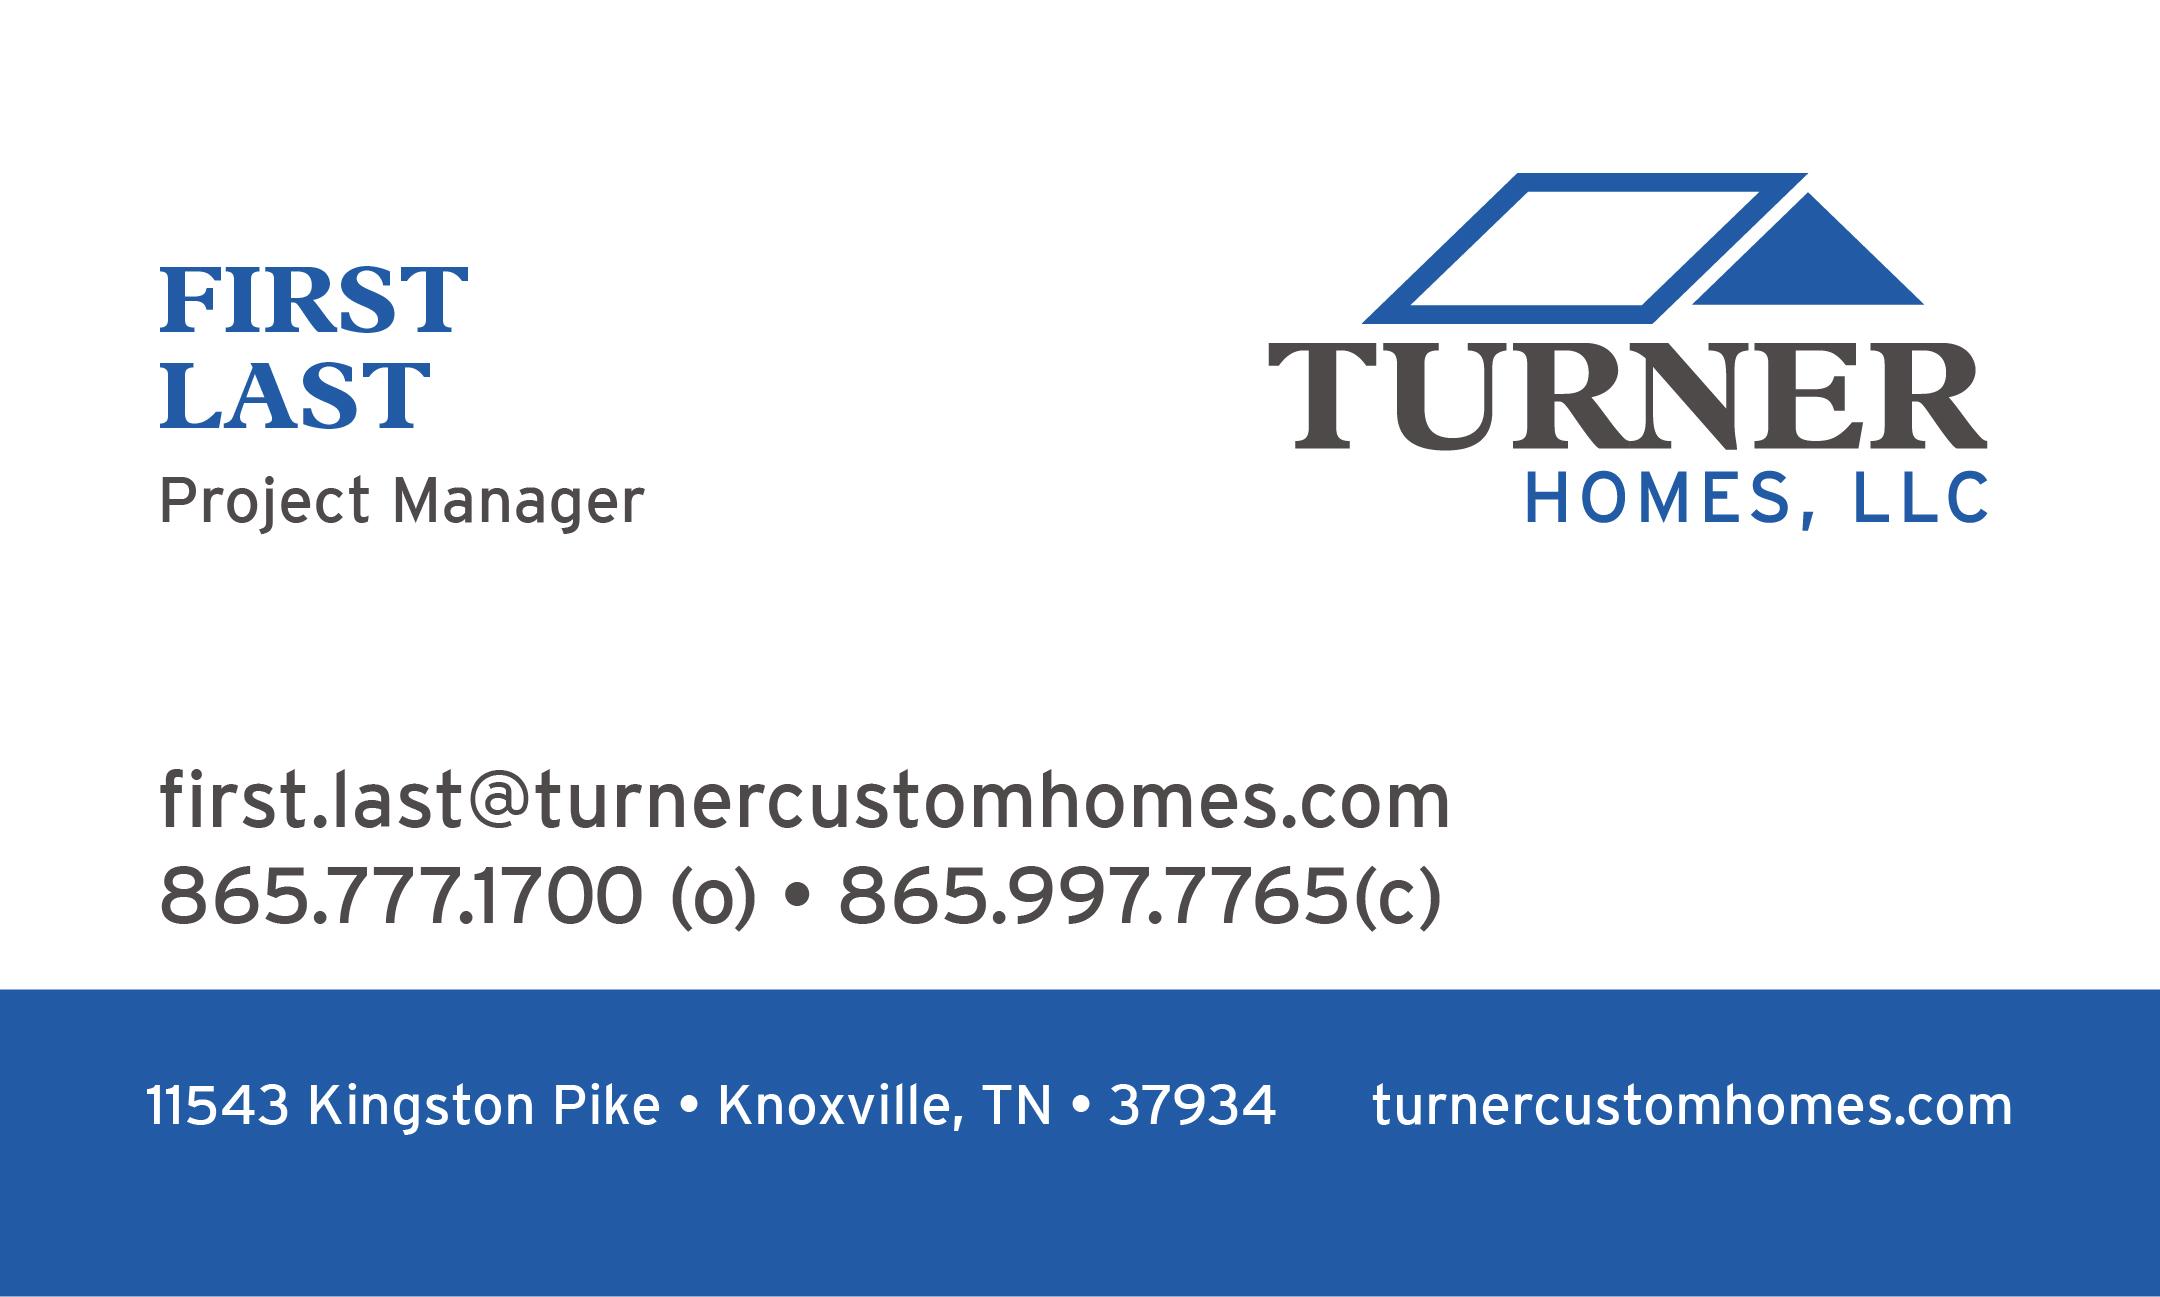 Ethan Beyer: Turner Properties - Turner Homes Business Cards